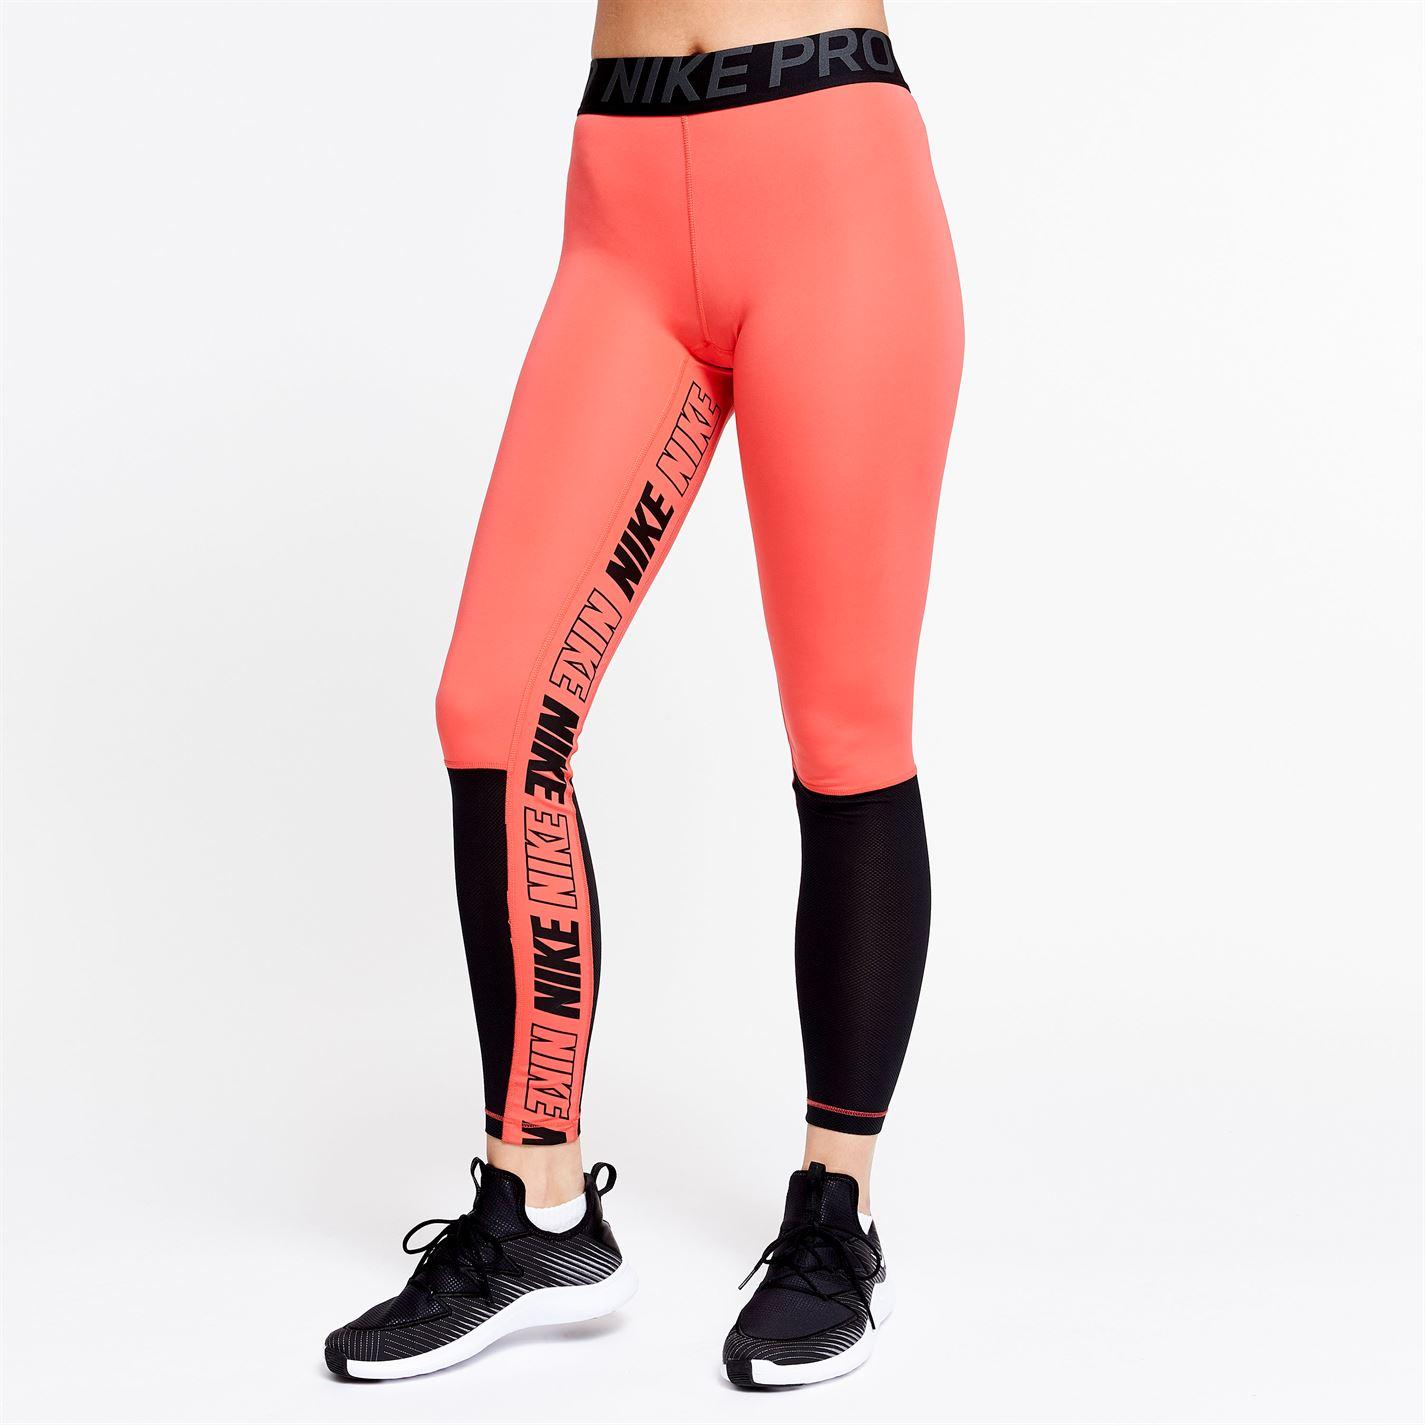 Legíny dámké Nike Pro Sports